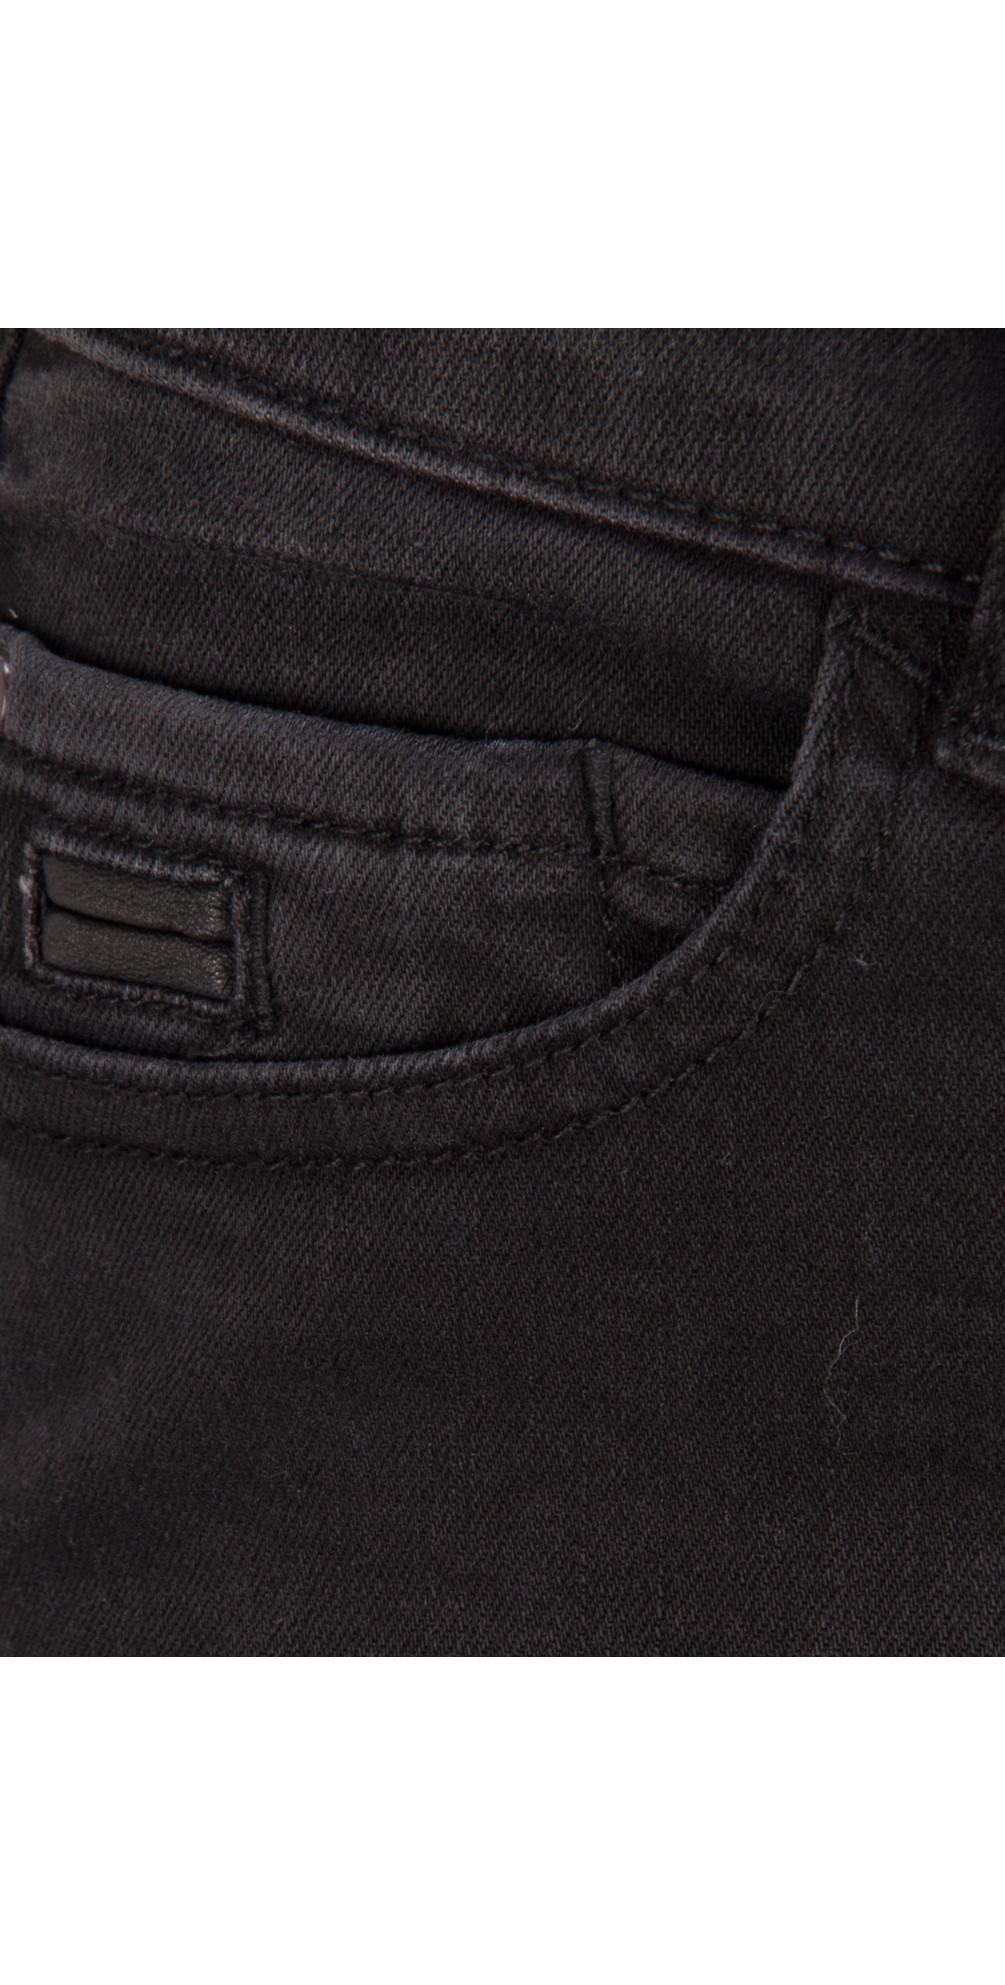 Overdyed Denim Skinny Pants main image